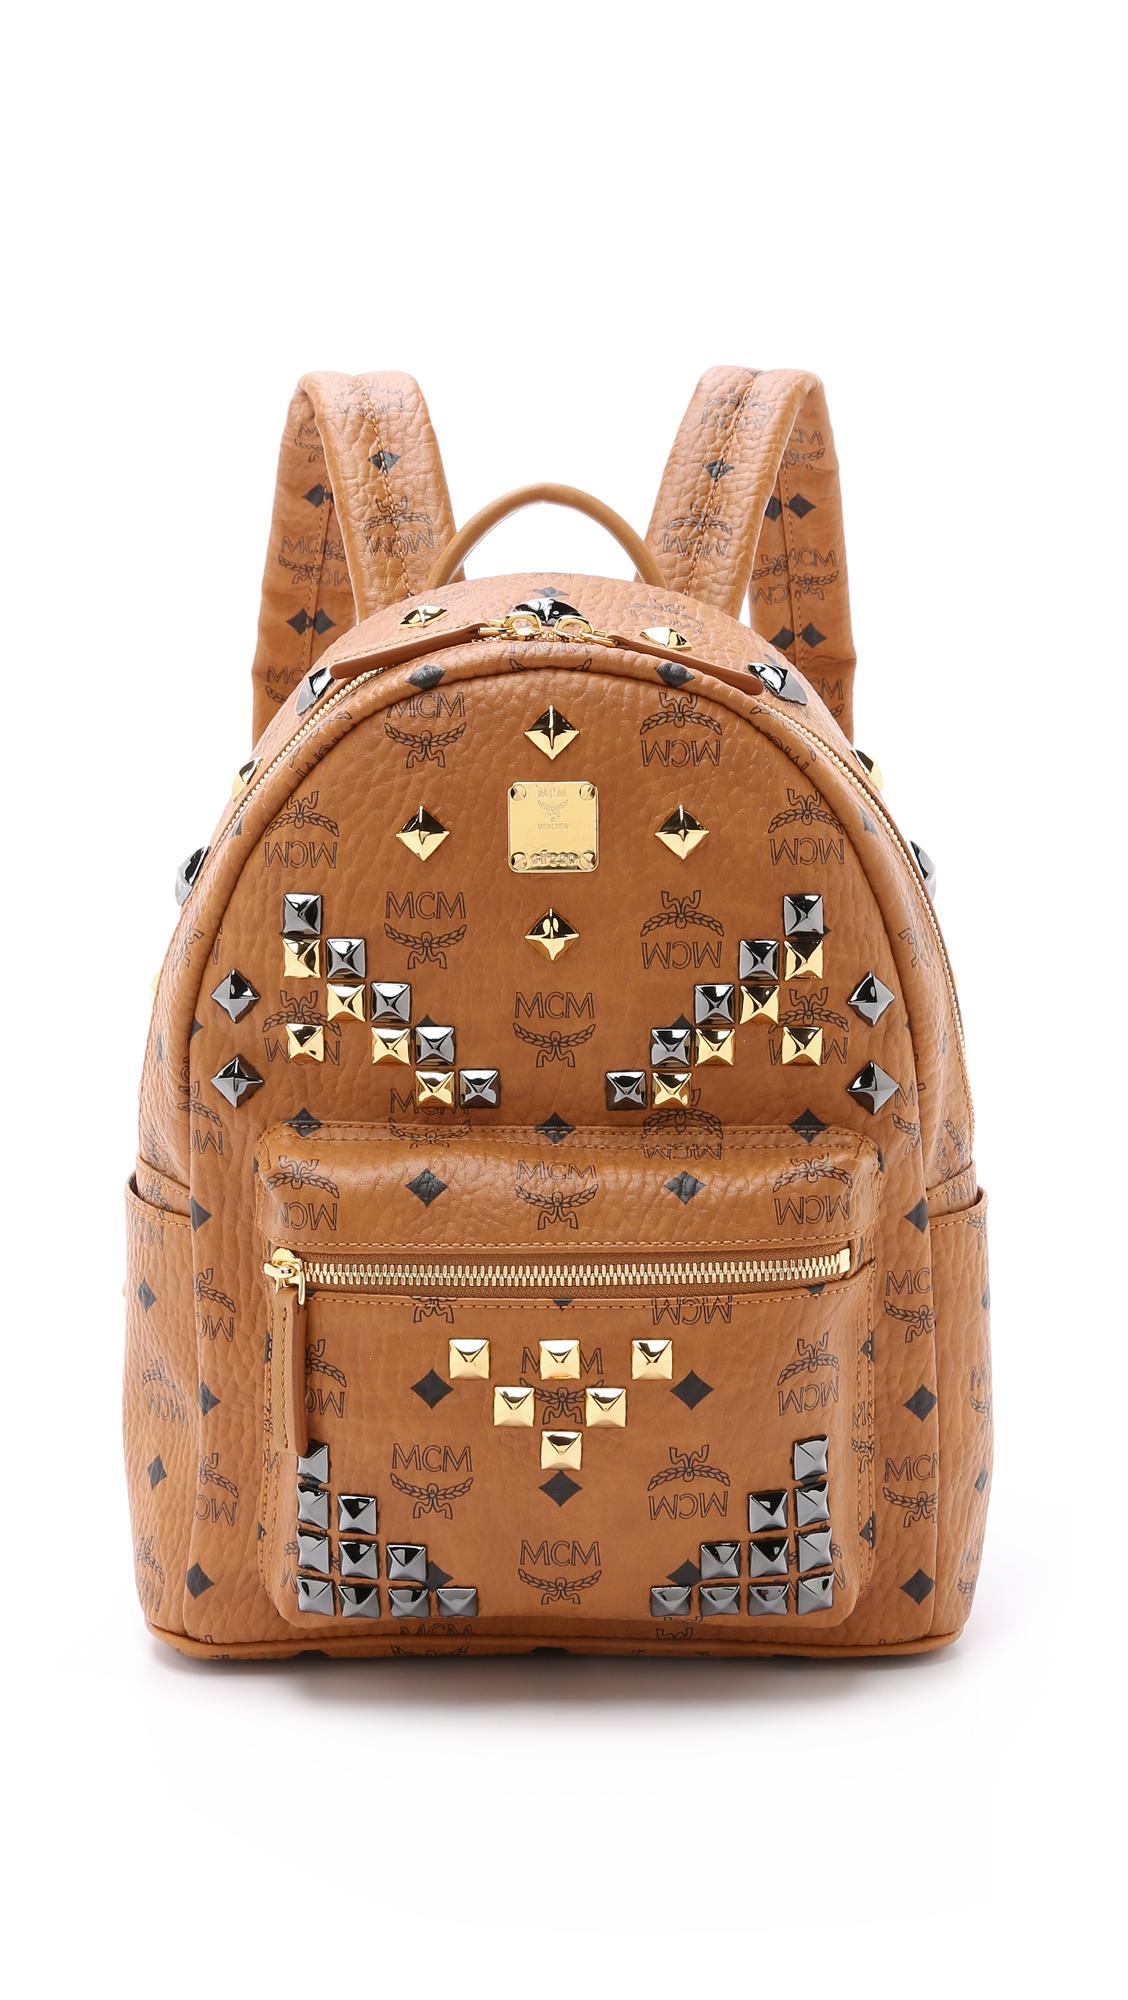 mcm stark x mini side stud backpack in brown lyst. Black Bedroom Furniture Sets. Home Design Ideas